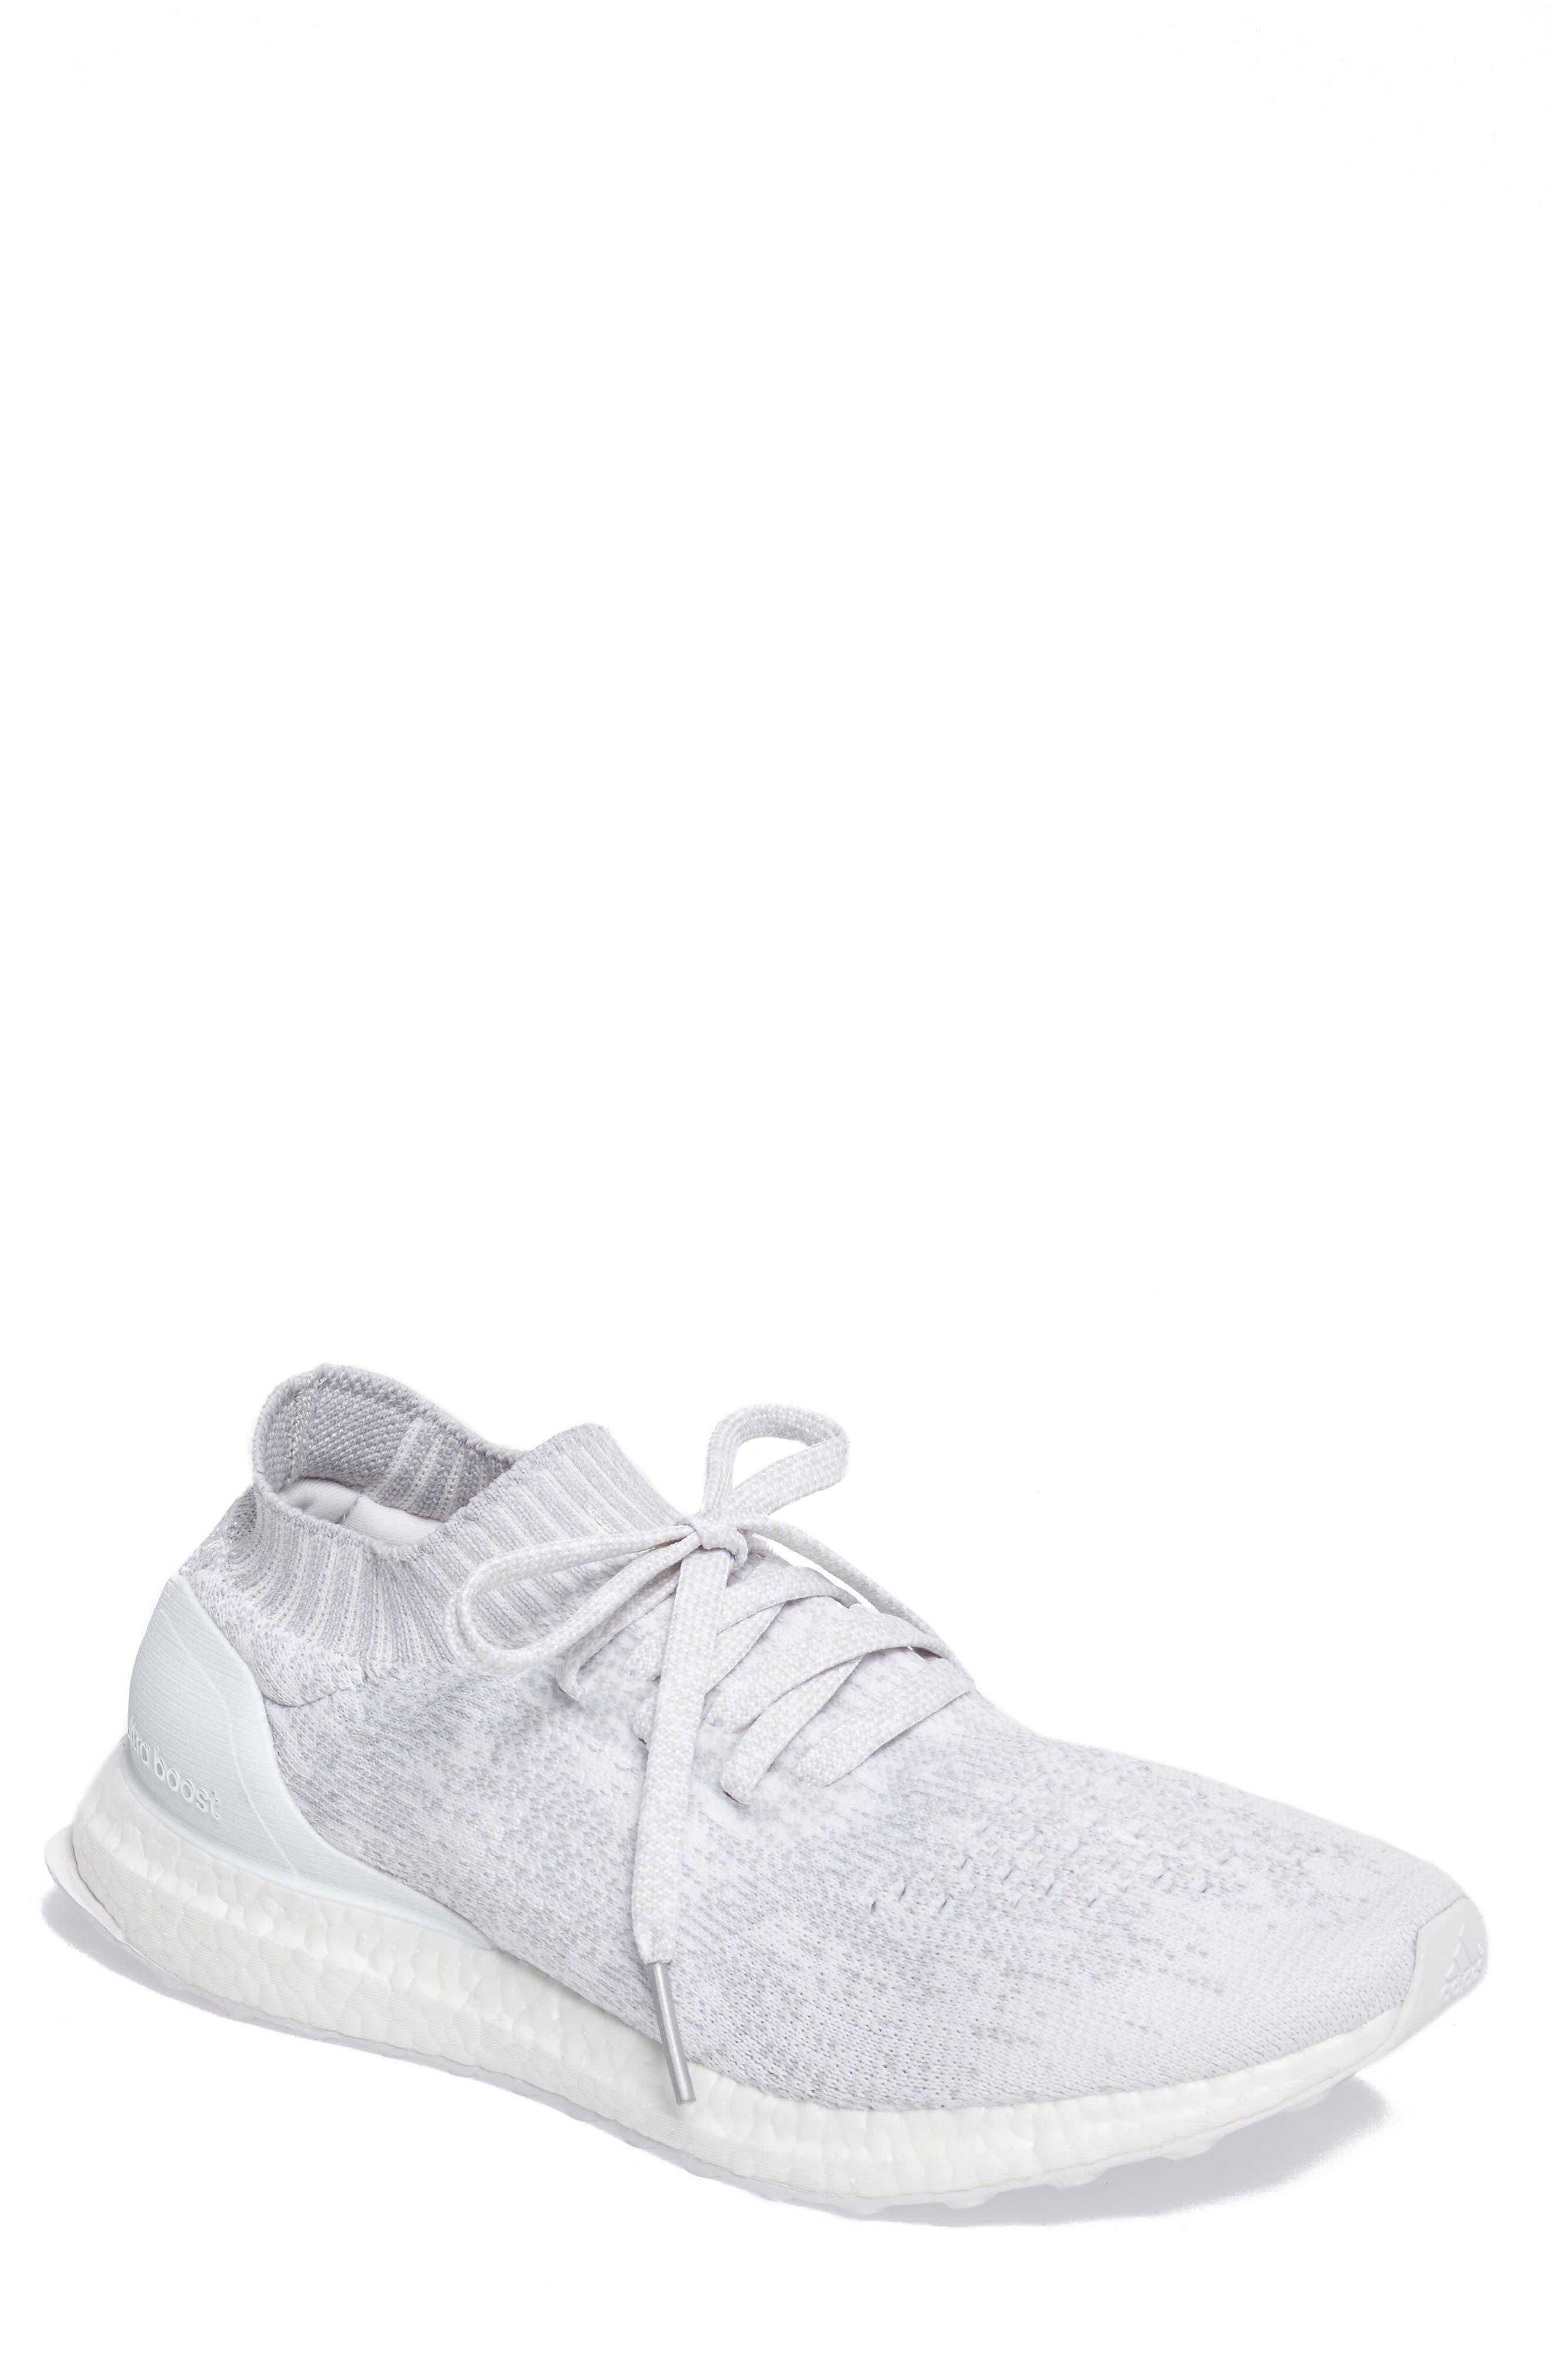 Alternate Image 1 Selected - adidas 'UltraBOOST Uncaged' Running Shoe (Men)